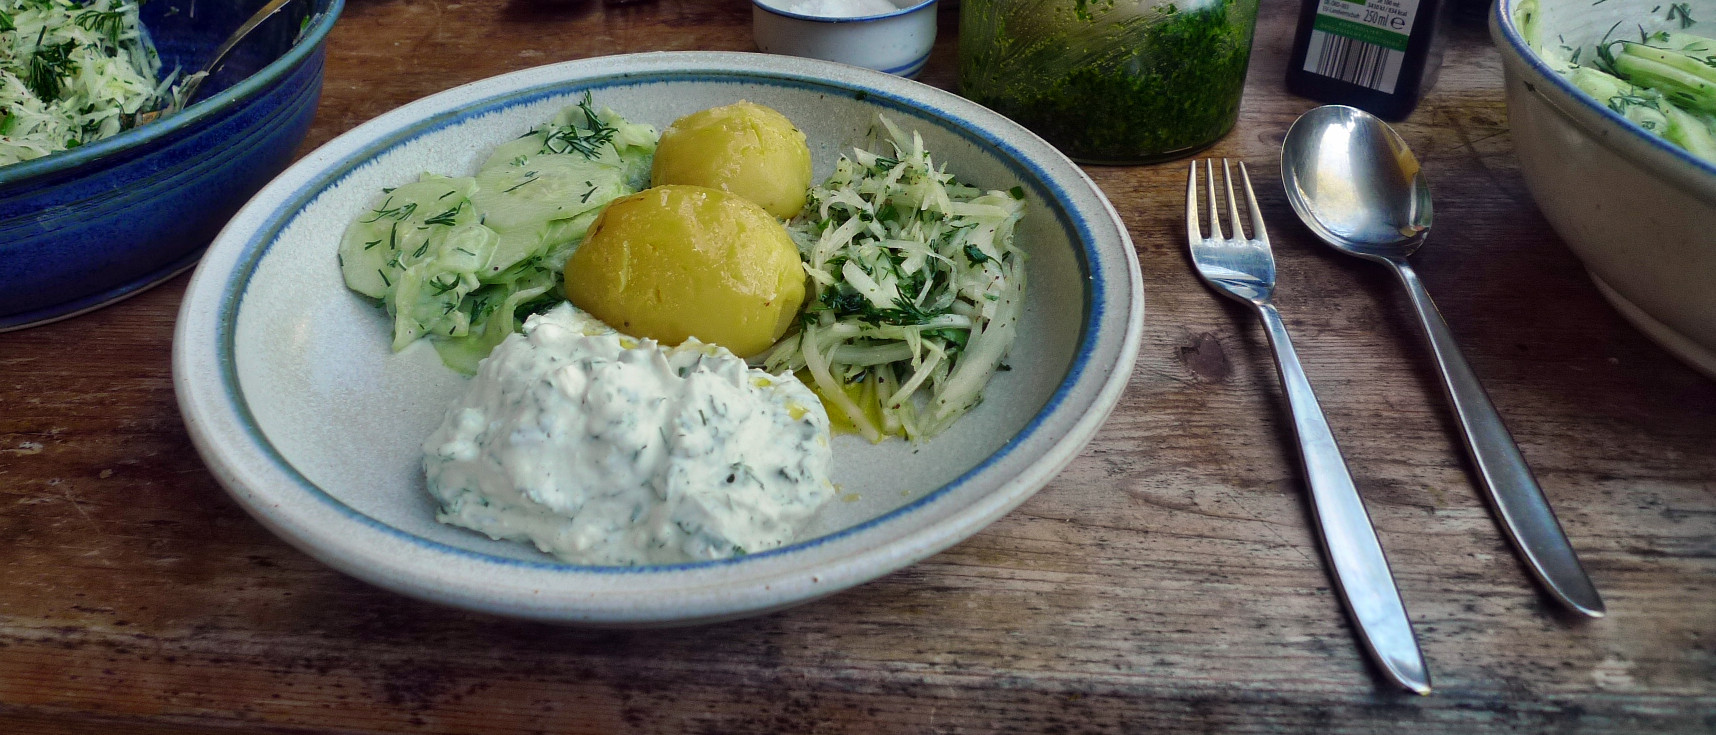 Quark,Kartoffeln,Salate - 24.4.15   (6)